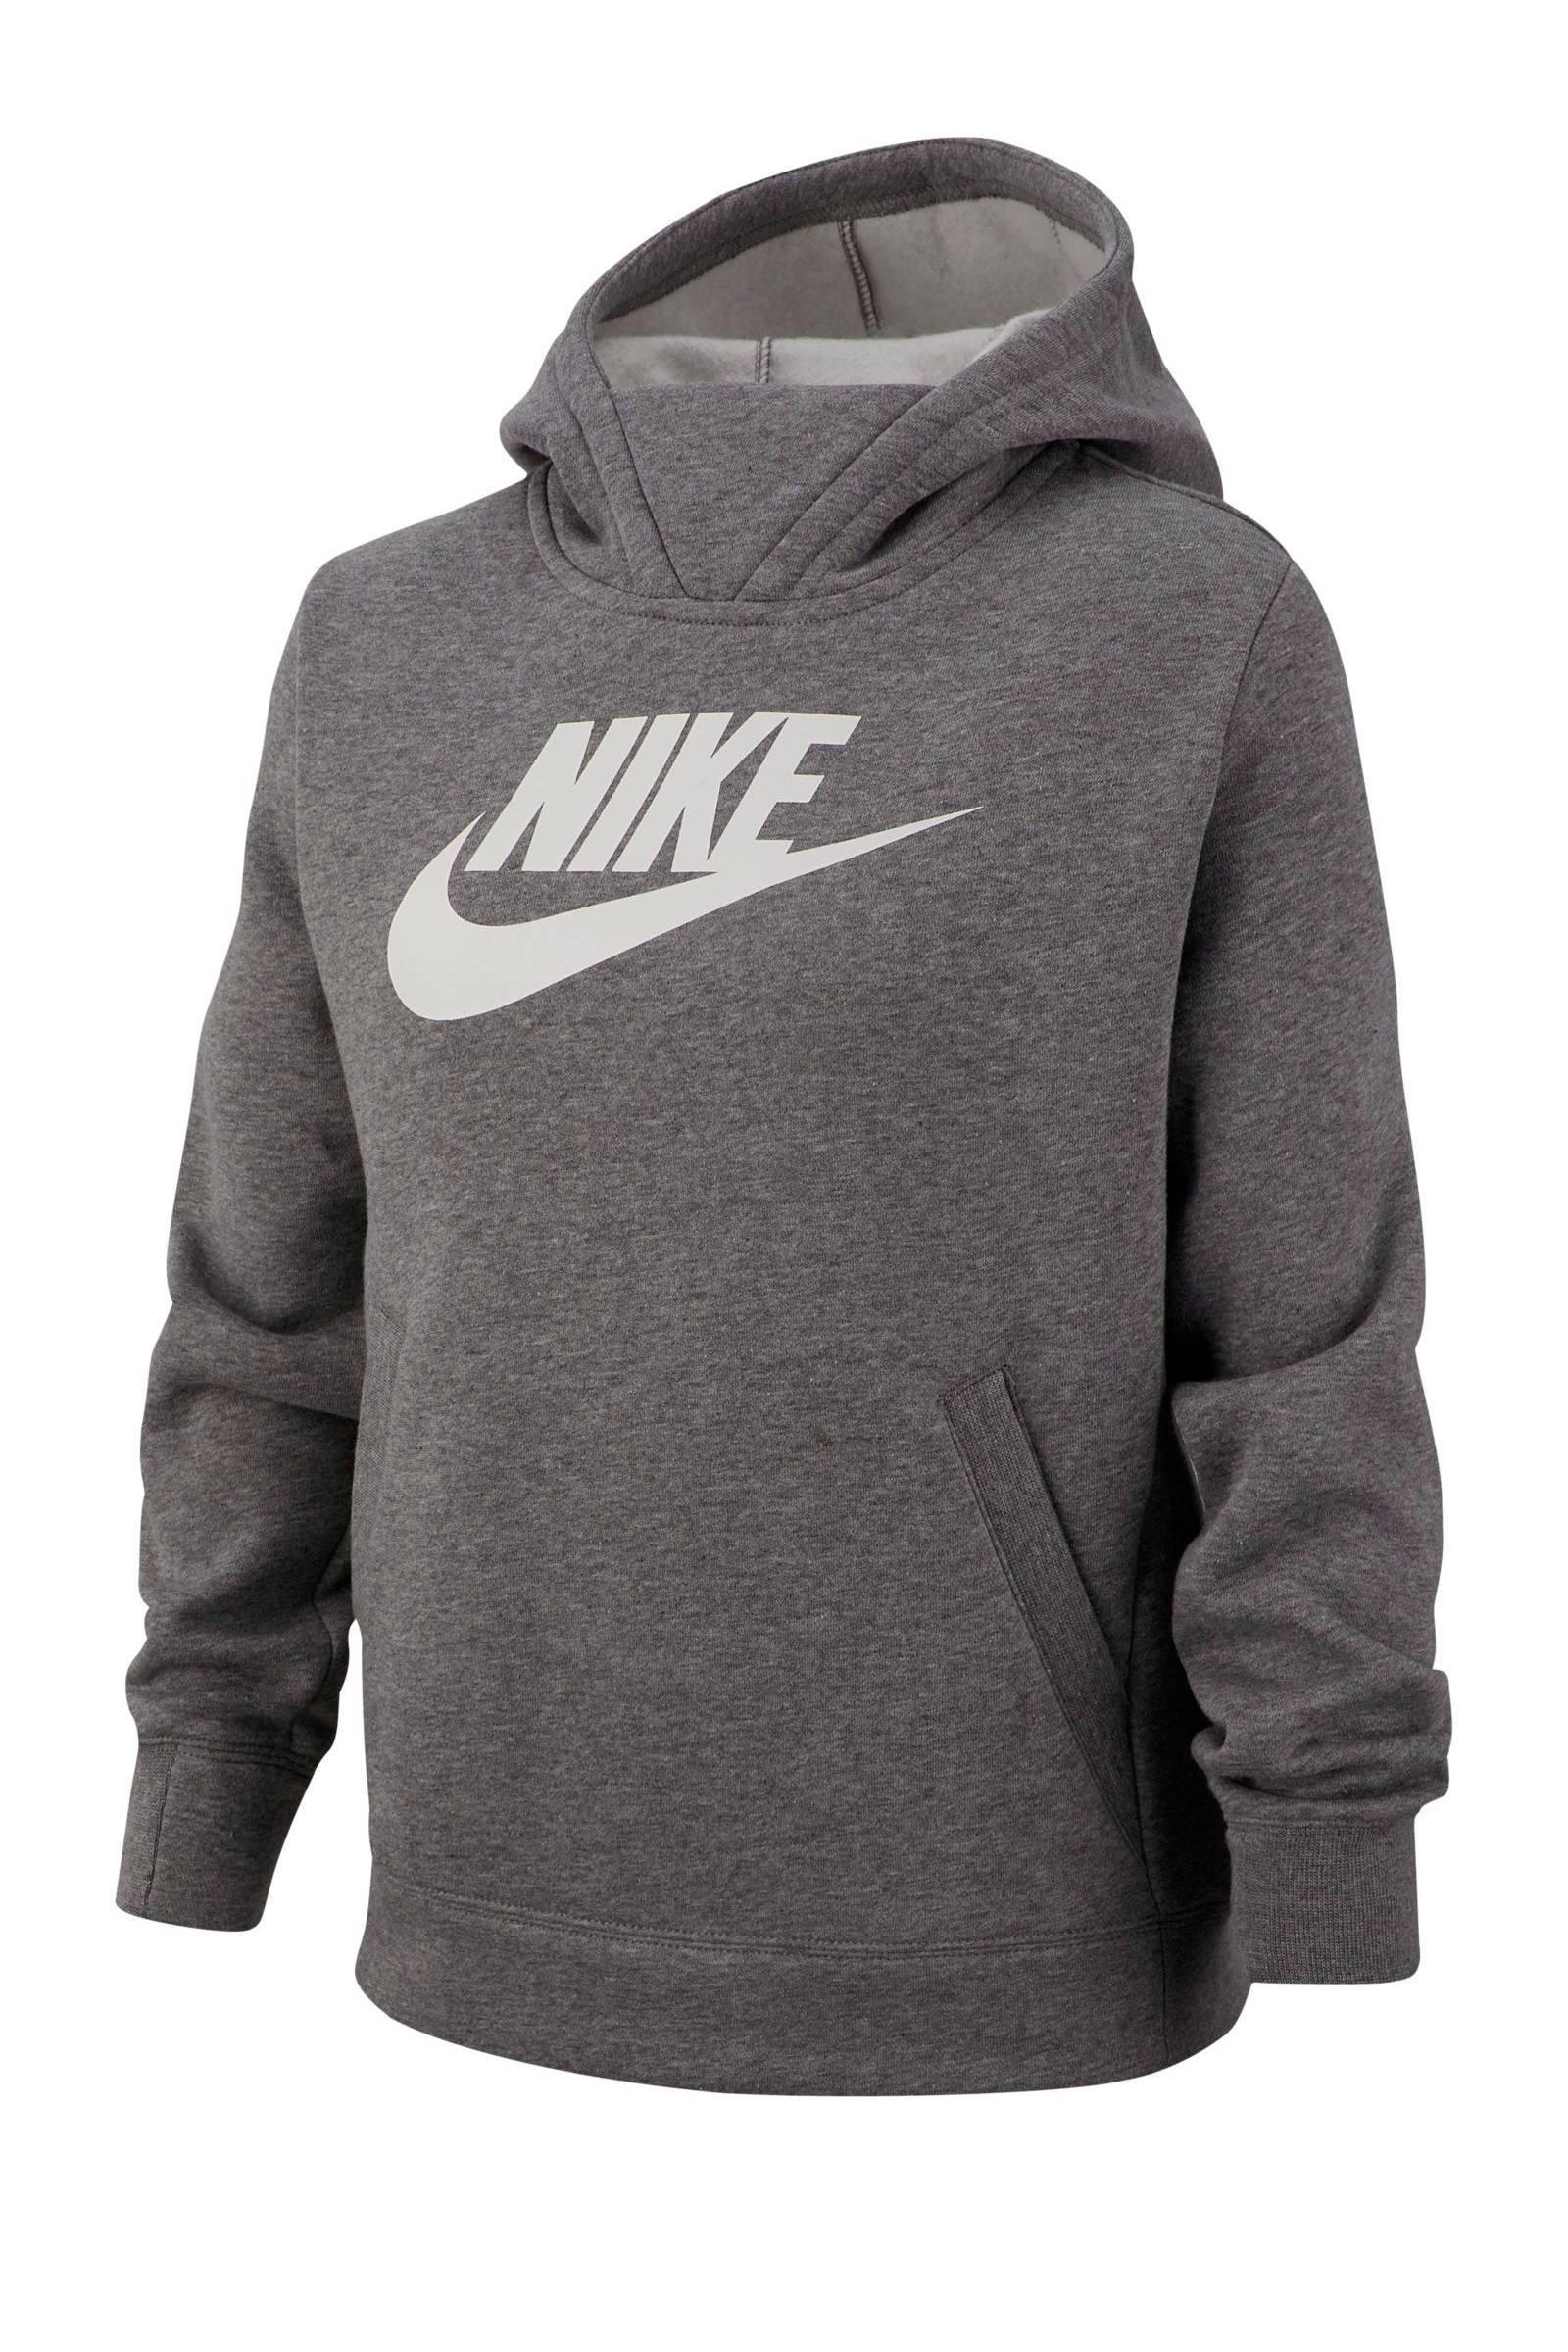 Nike sweater met printopdruk rood | wehkamp